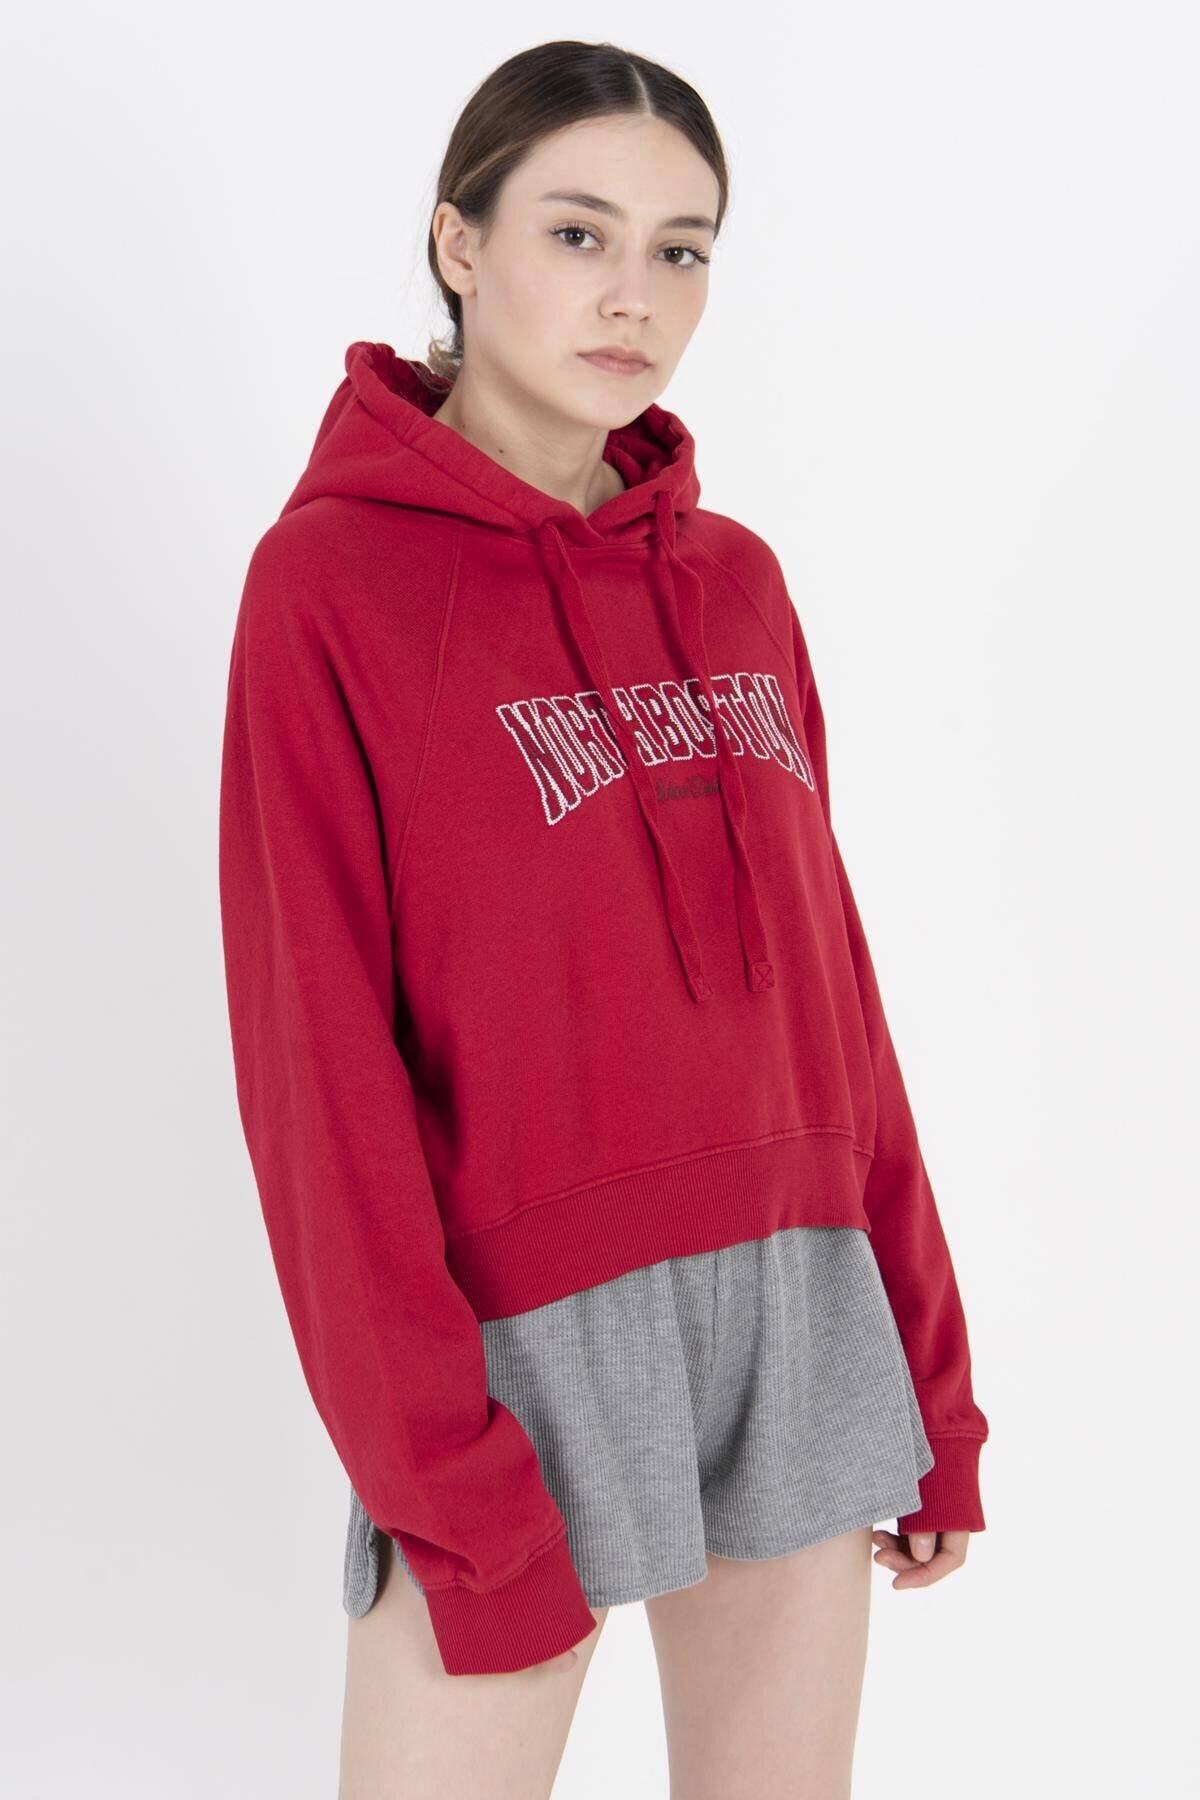 Addax Kadın Kırmızı Yazı Detaylı Kapşonlu Sweat S12144 ADX-0000022959